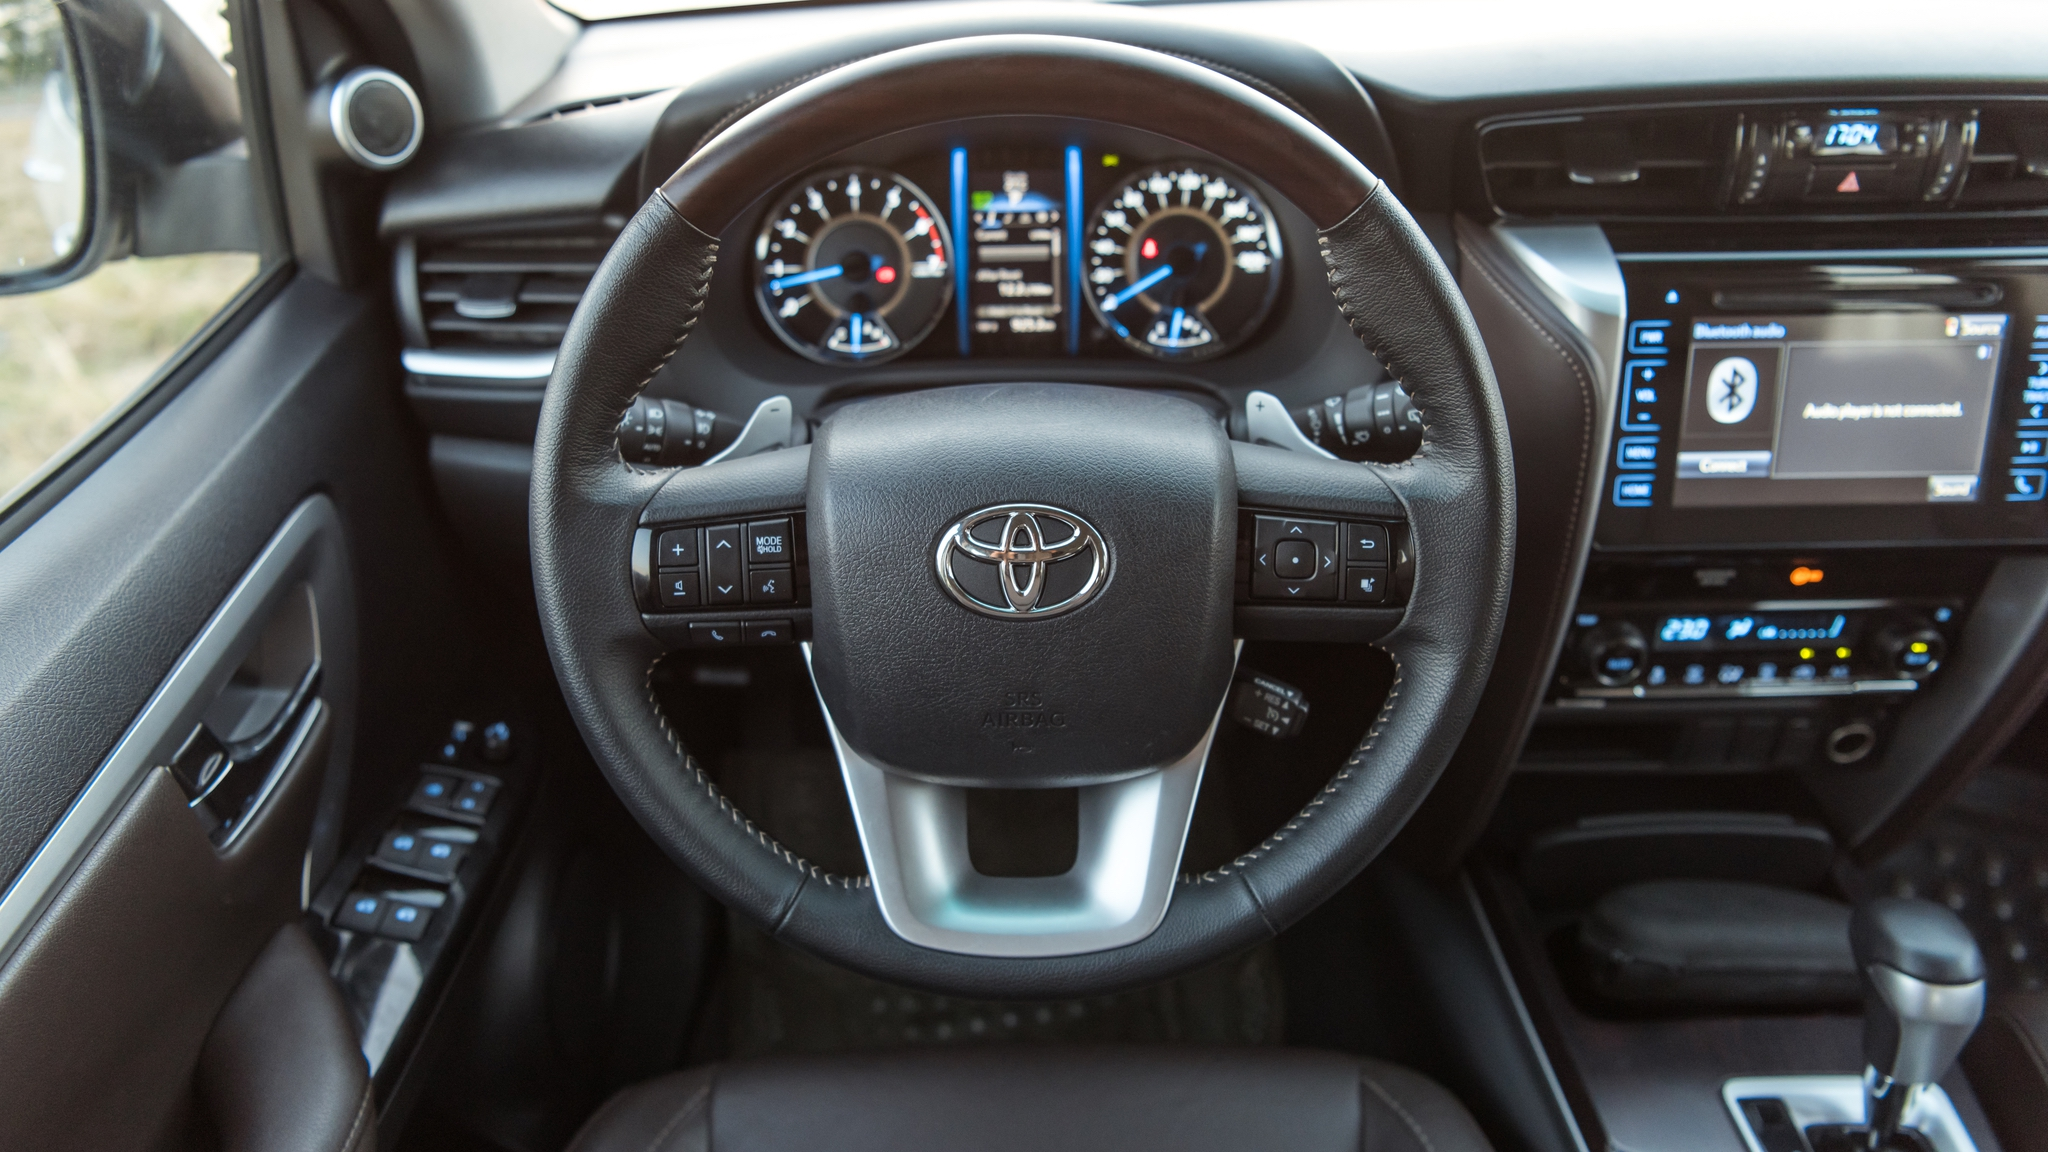 toyota-fortuner-trd-interior-autodaily-09.jpg